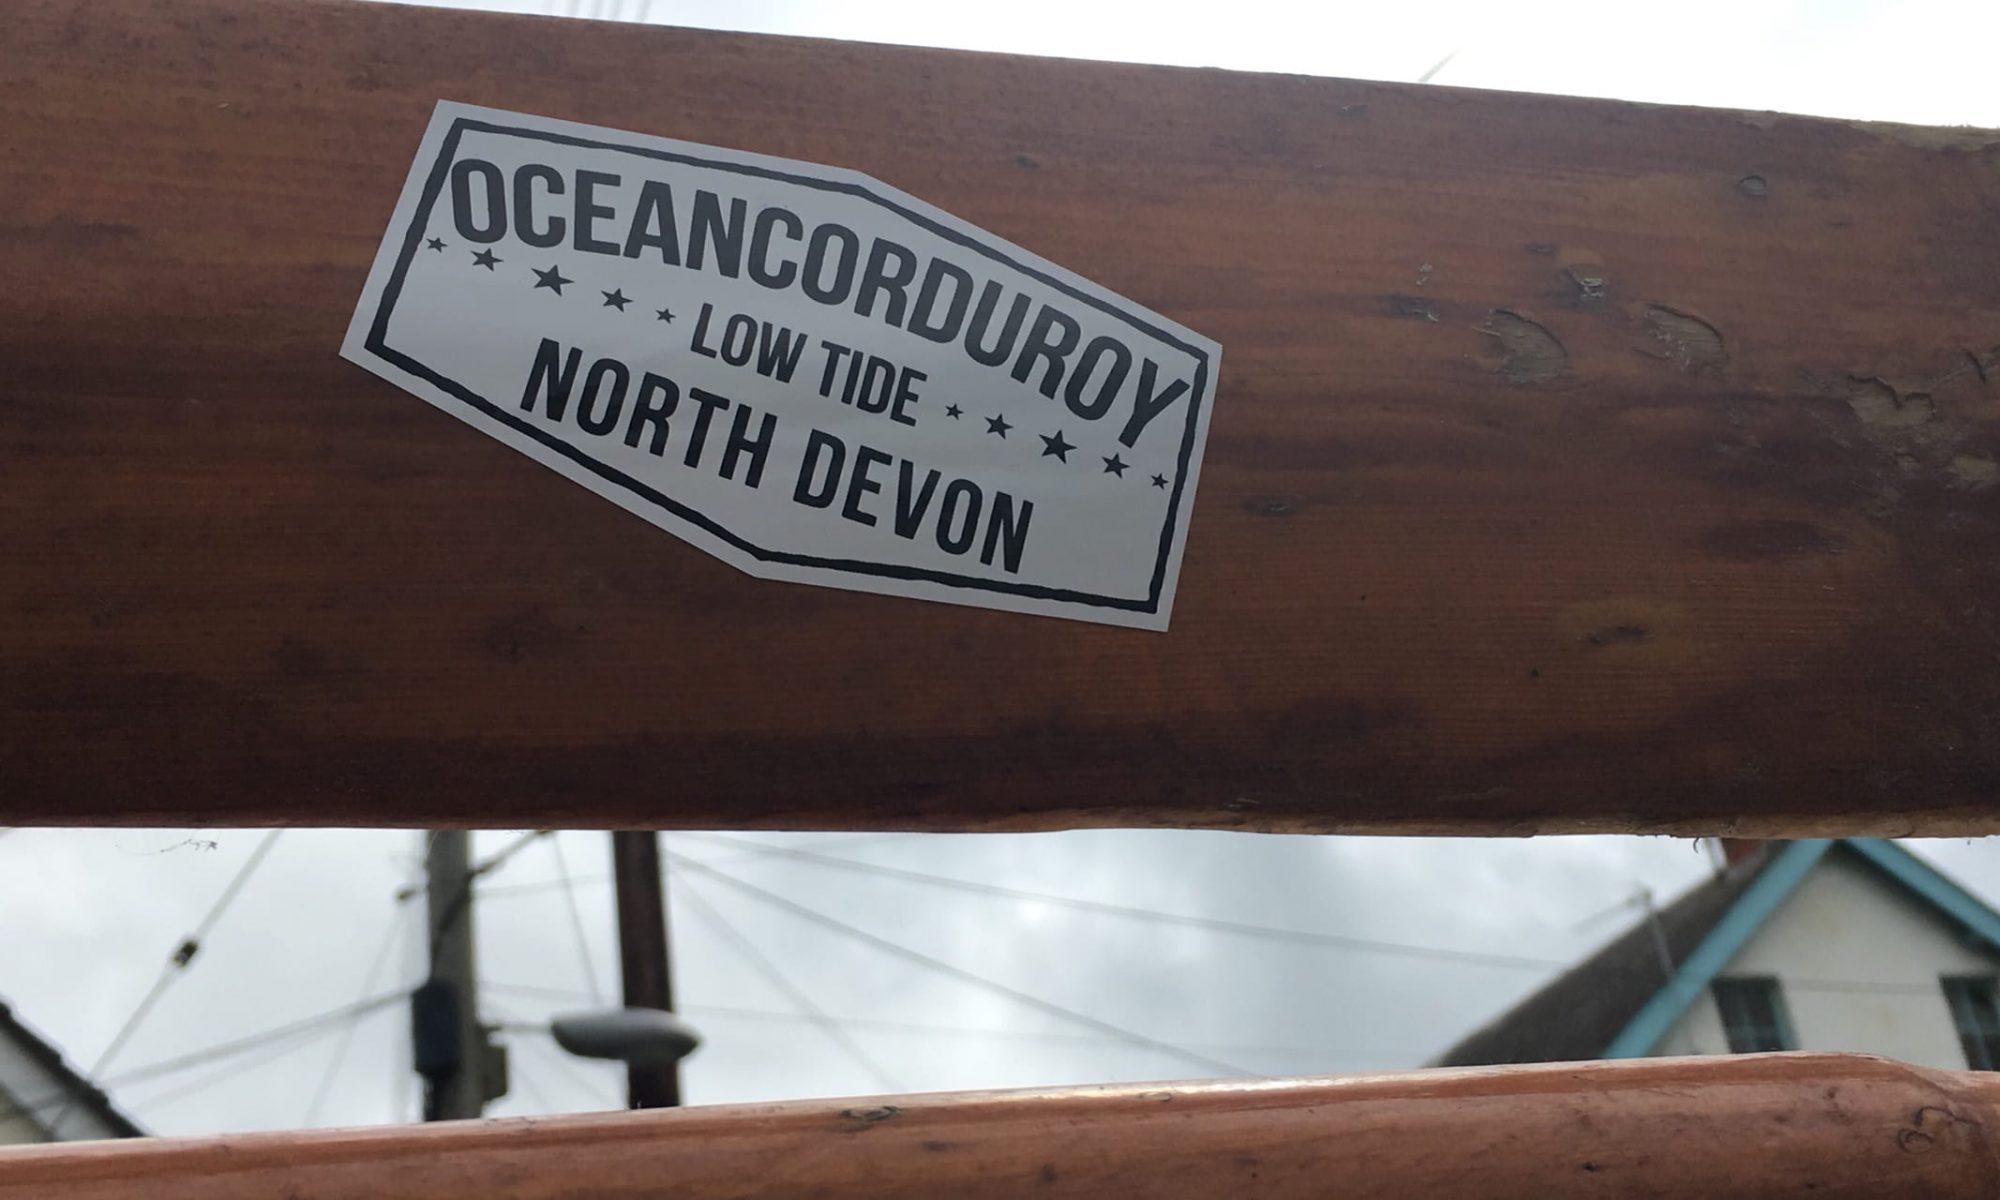 Ocean Corduroy